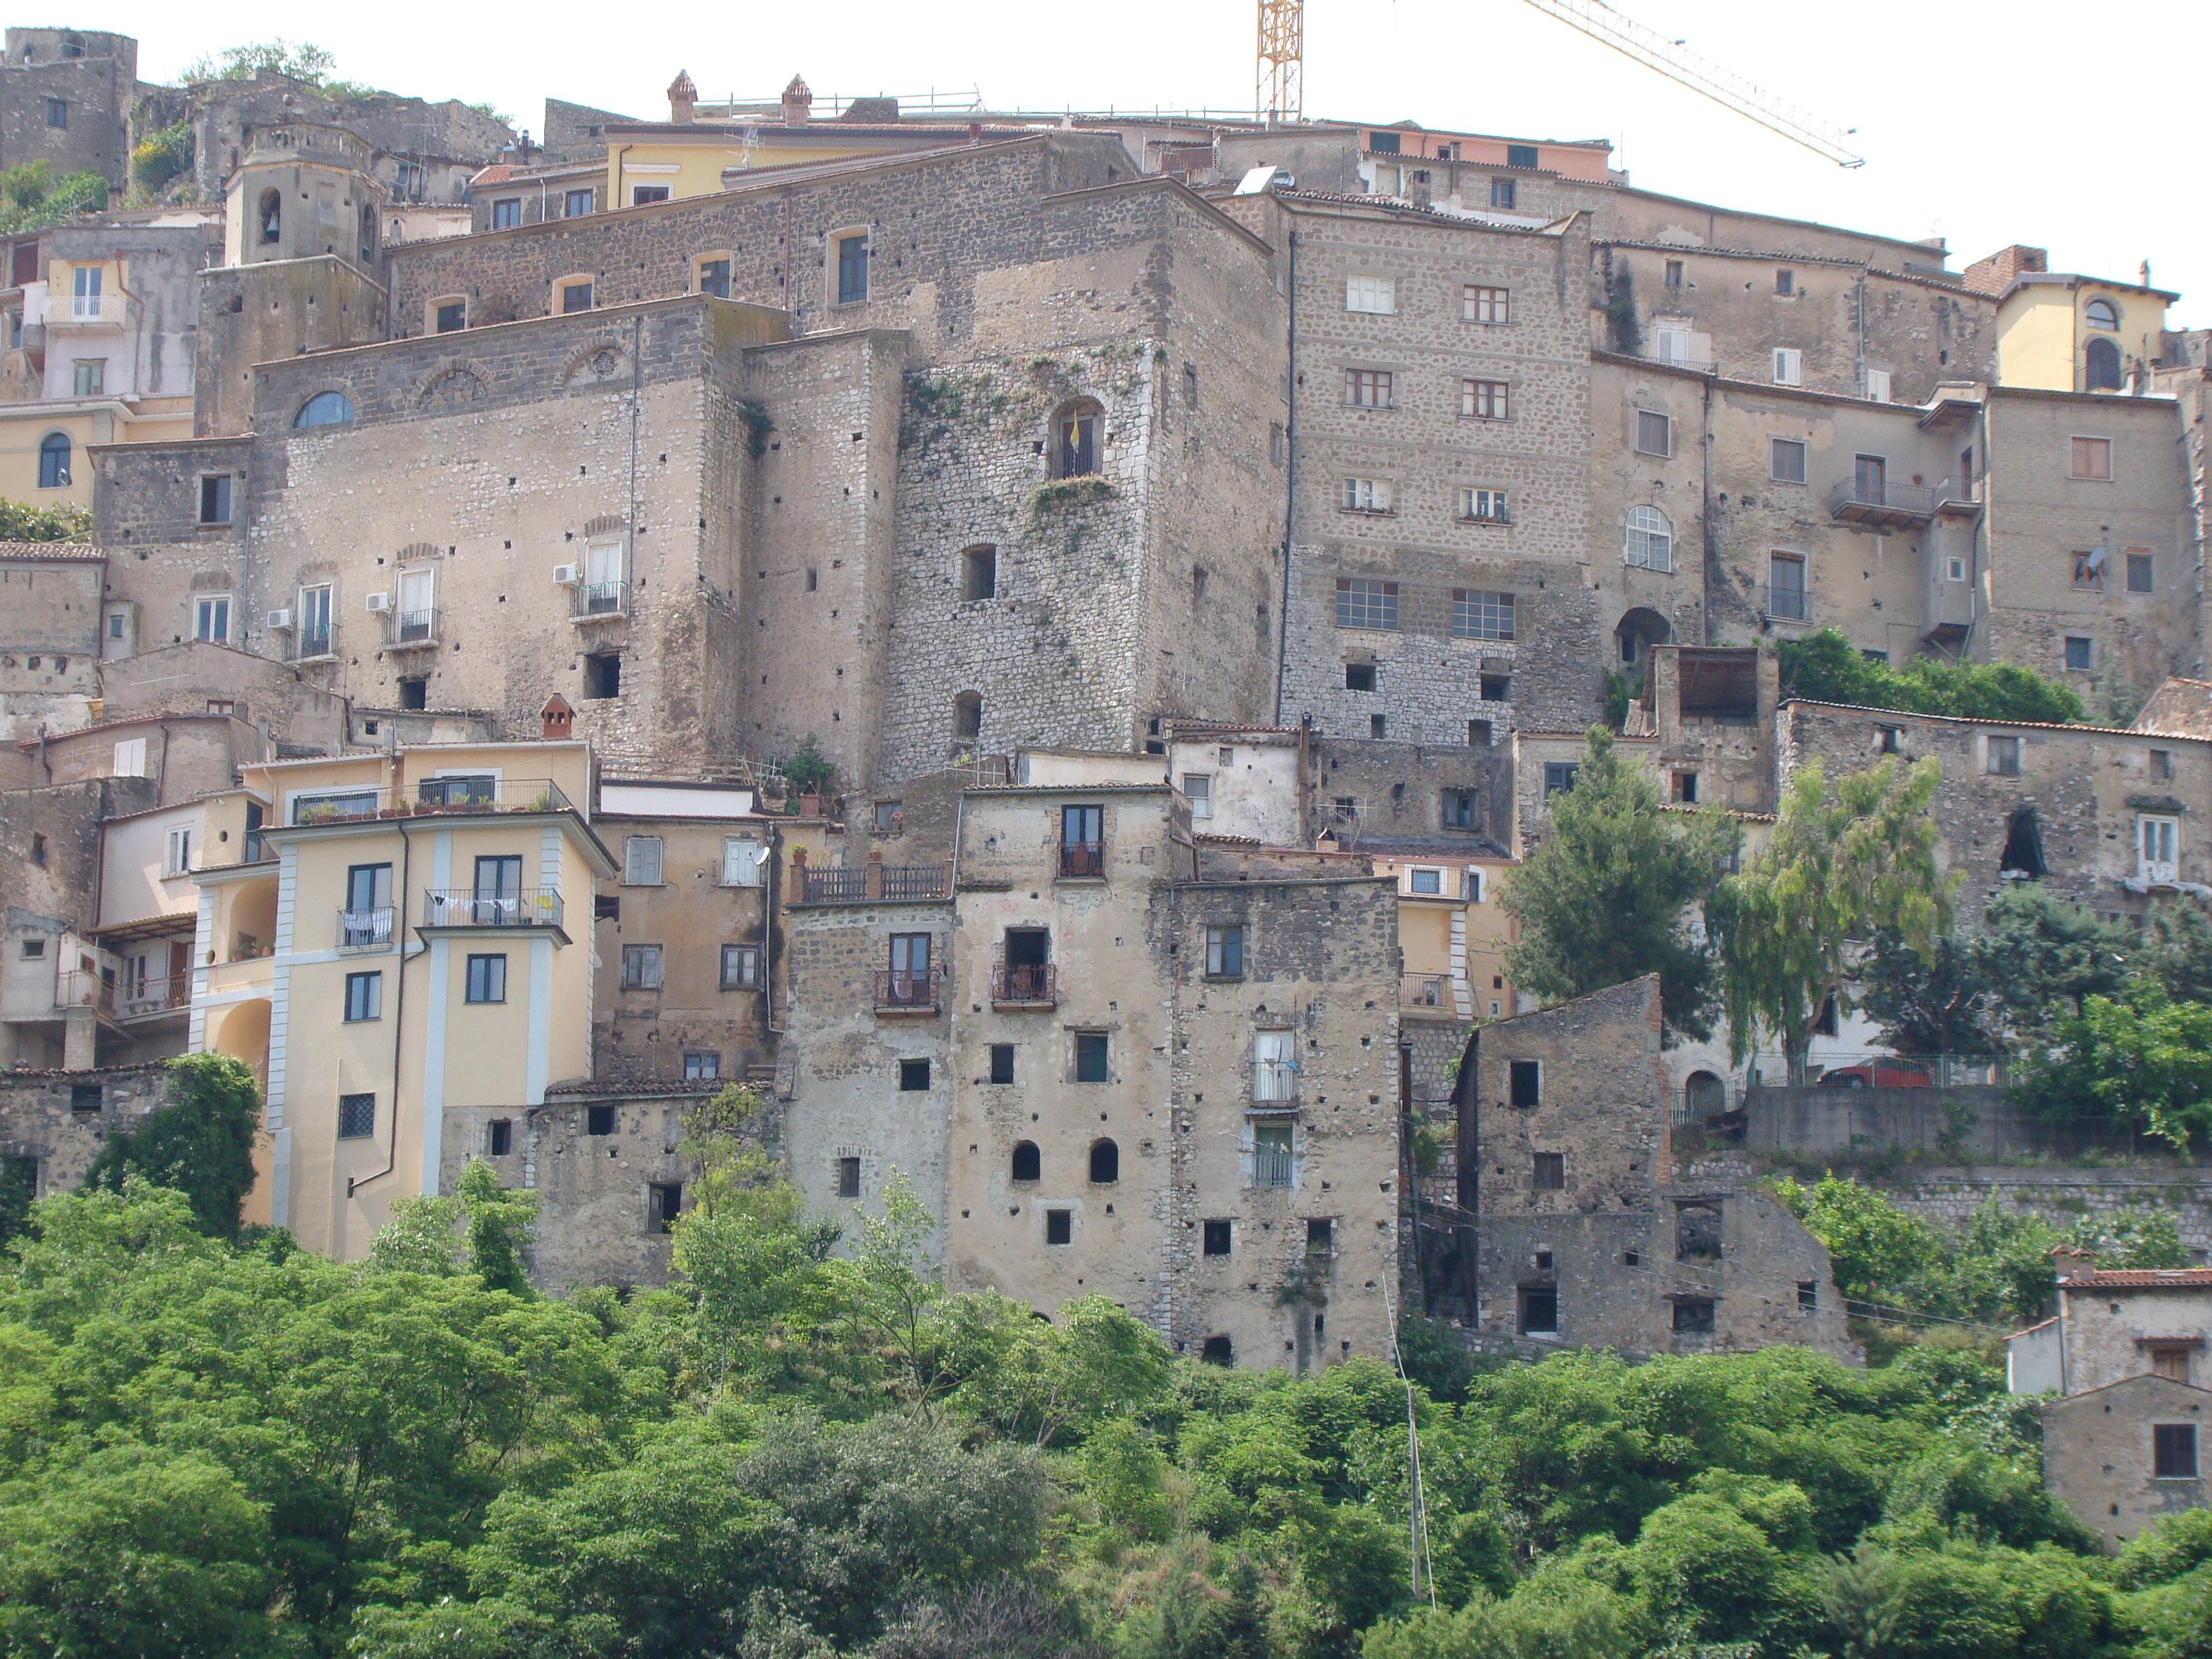 Caserta Italy  city pictures gallery : Pietravairano, Caserta, Italy | 20 Prospect